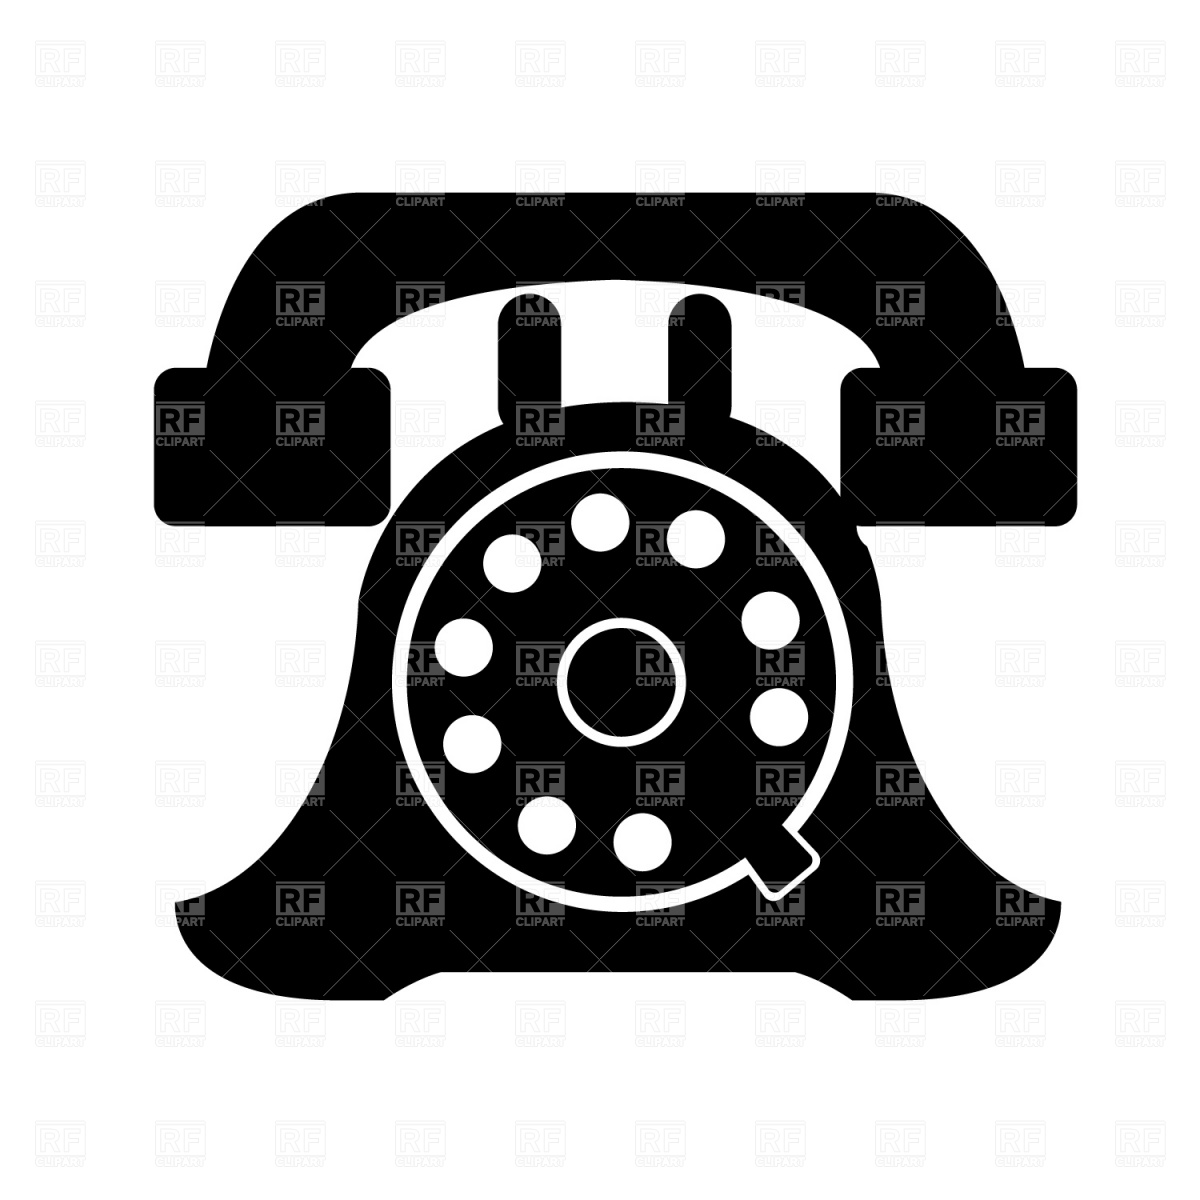 Telephone receiver icon Vector Image #1298.